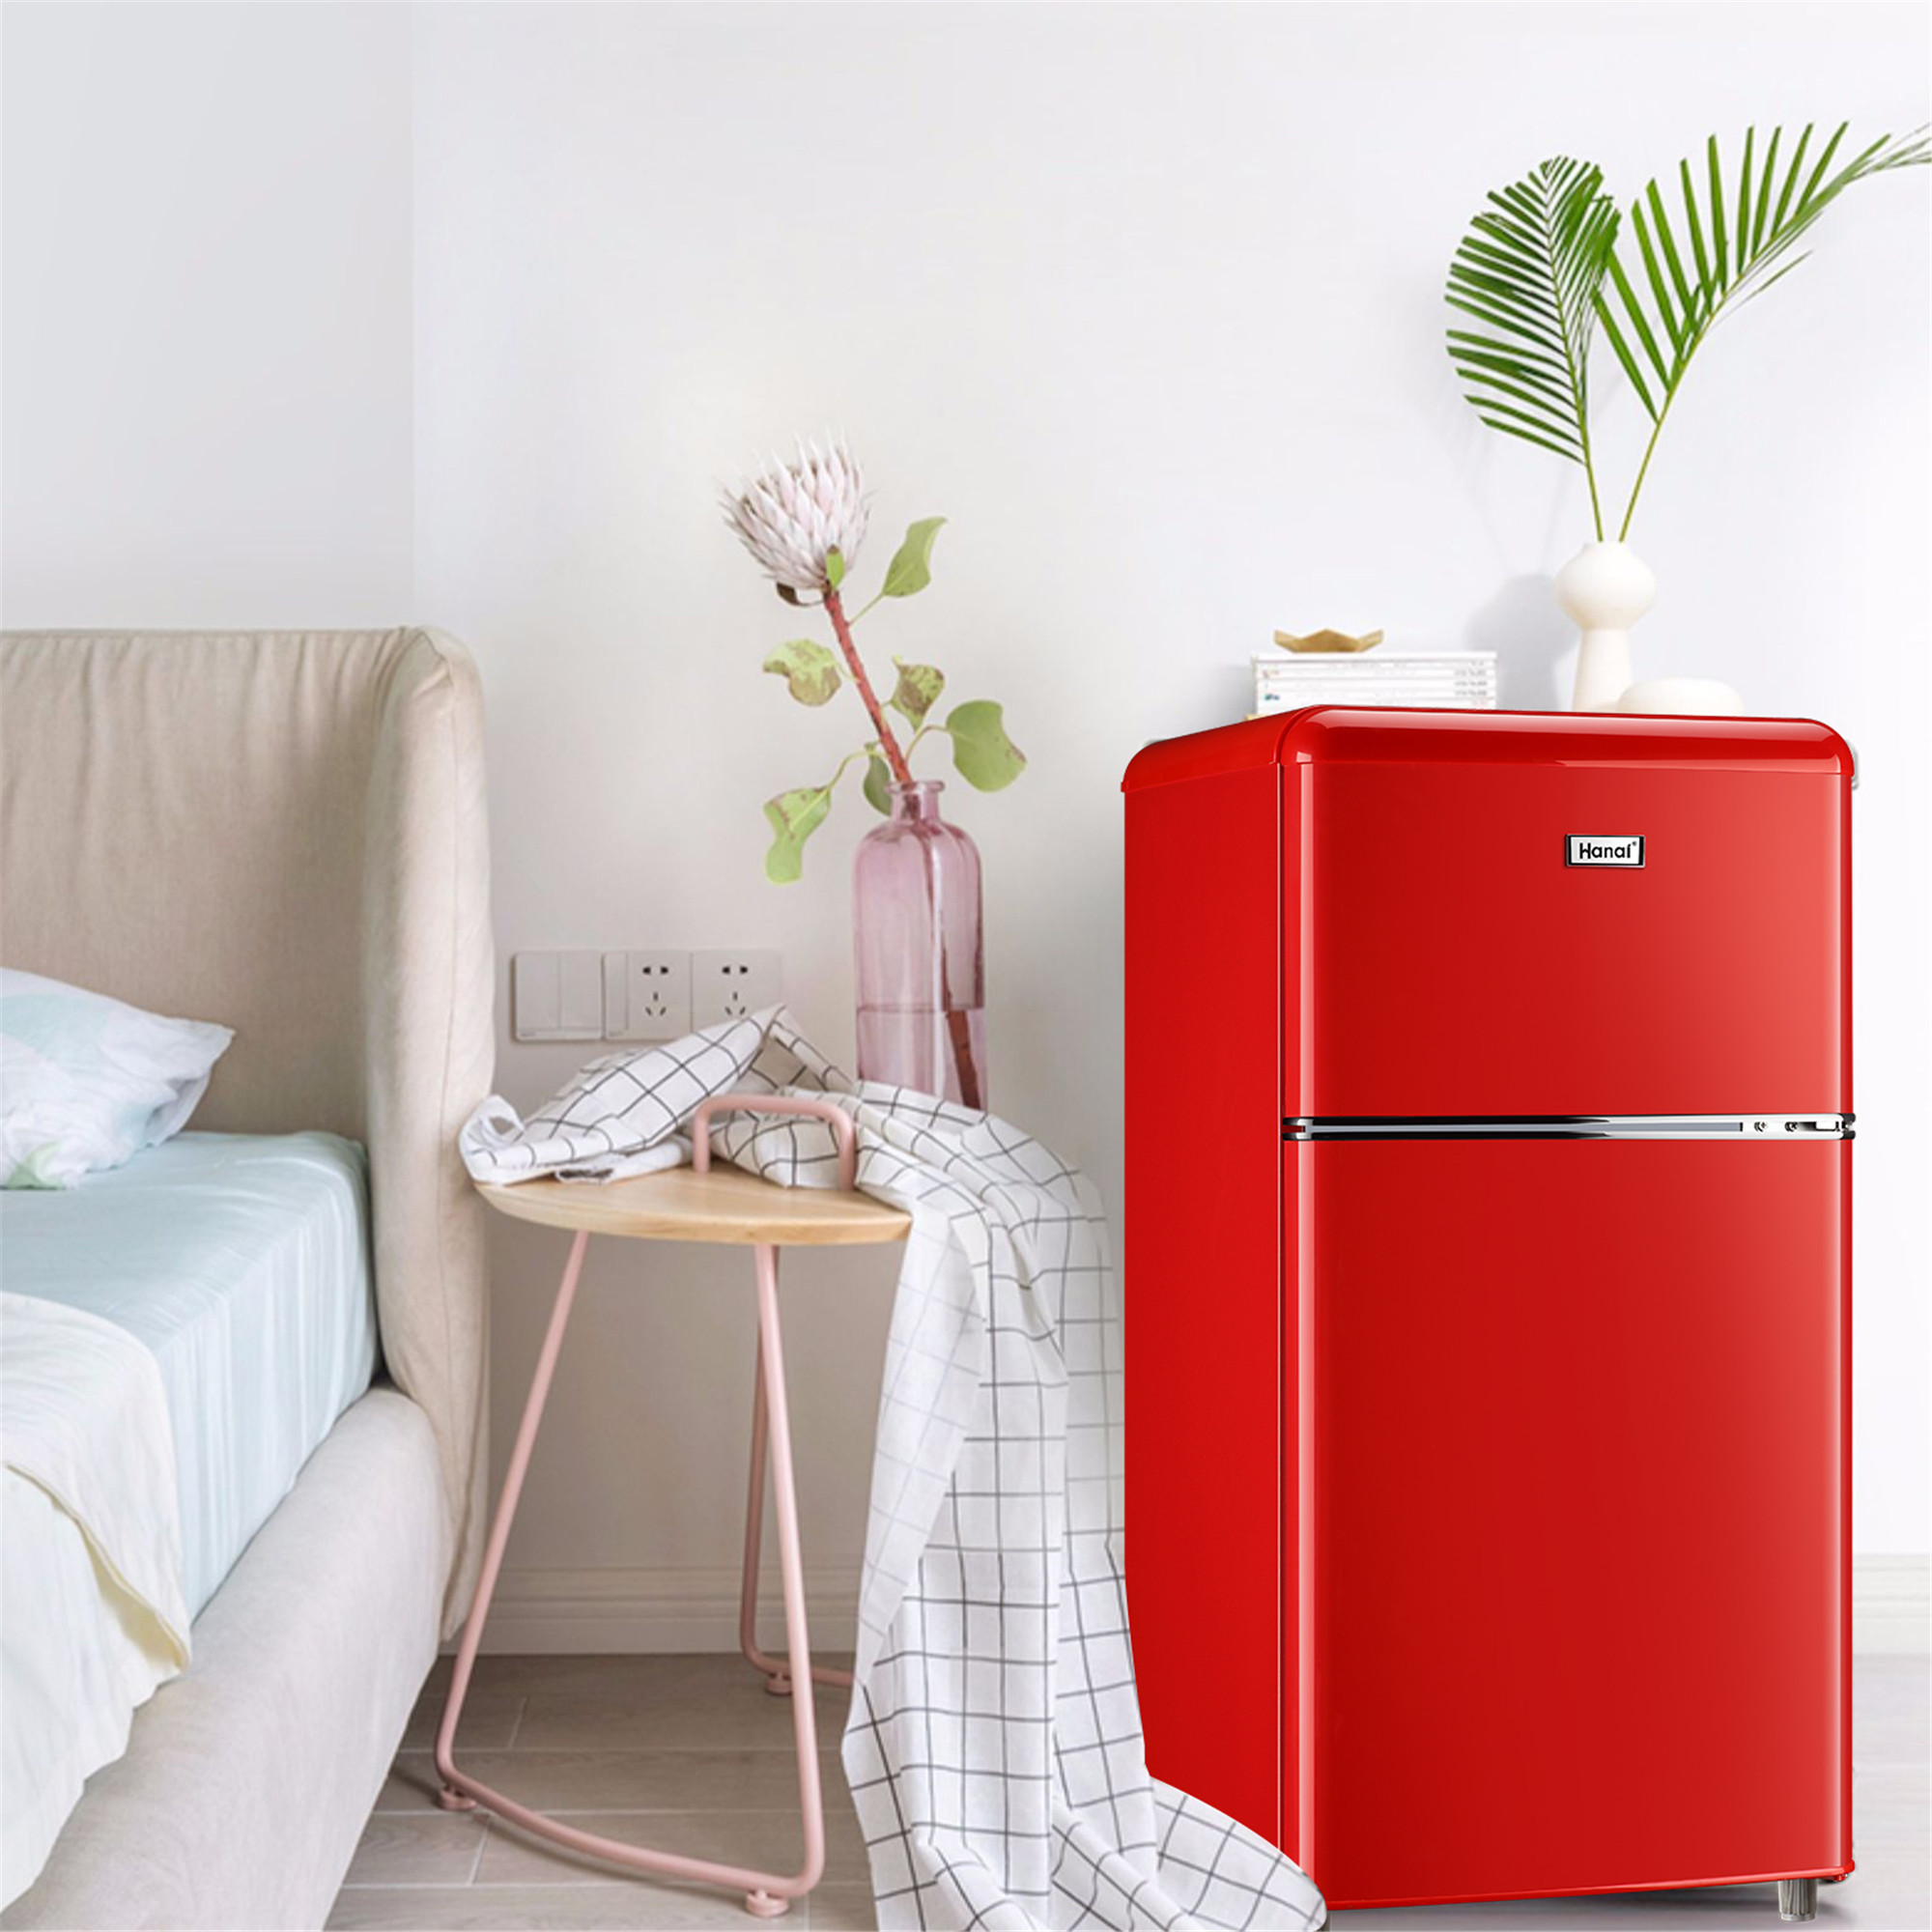 small fridge for dorm wanai 3 2 cu ft two door mini fridge classic retro refrigerator for home garage and office walmart com